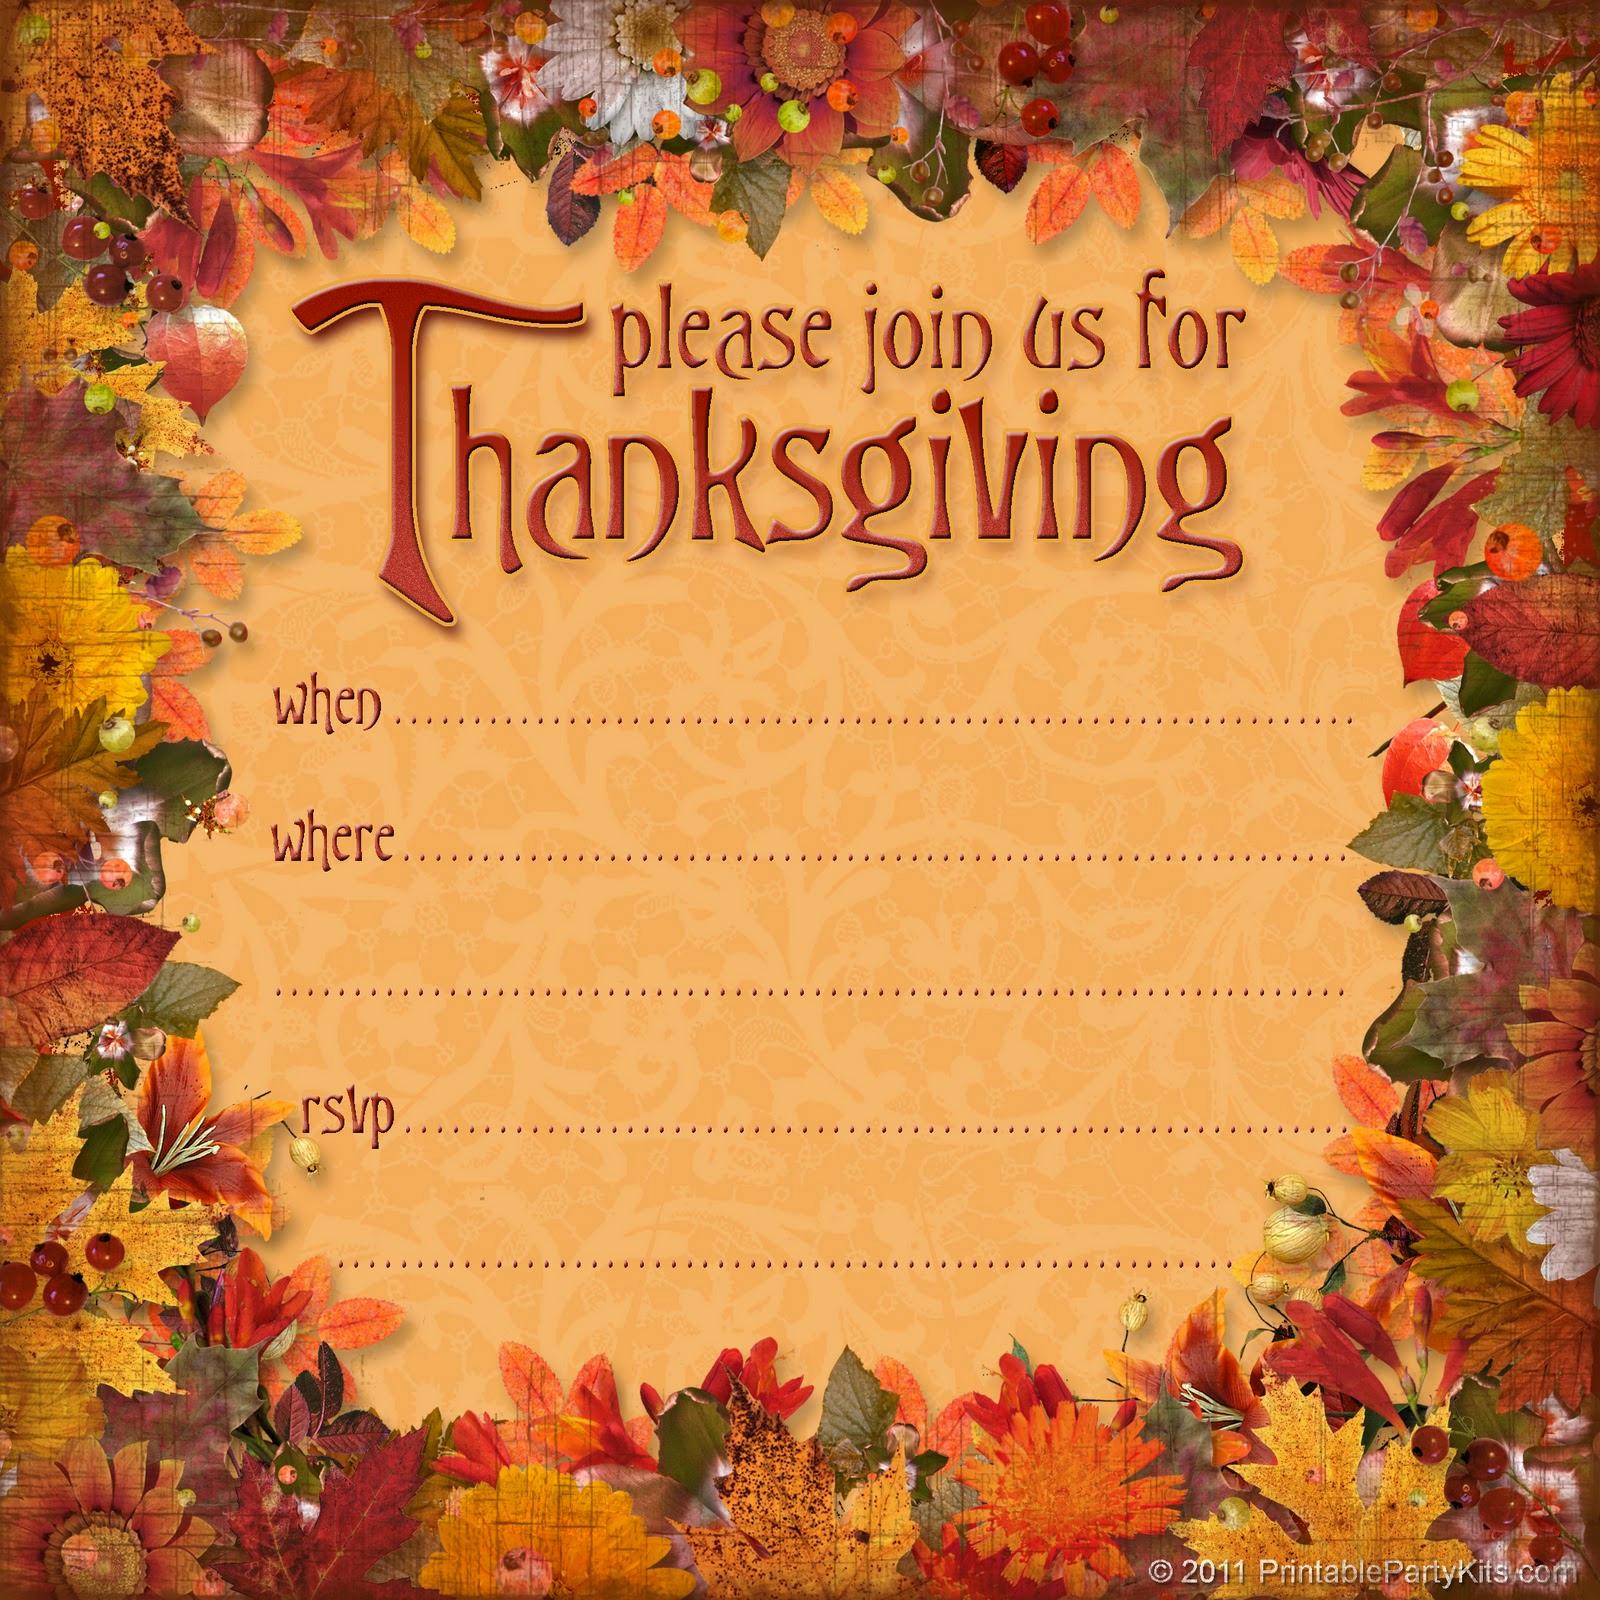 Free Thanksgiving Invitation Templates Fresh Free Printable Party Invitations Free Thanksgiving Dinner